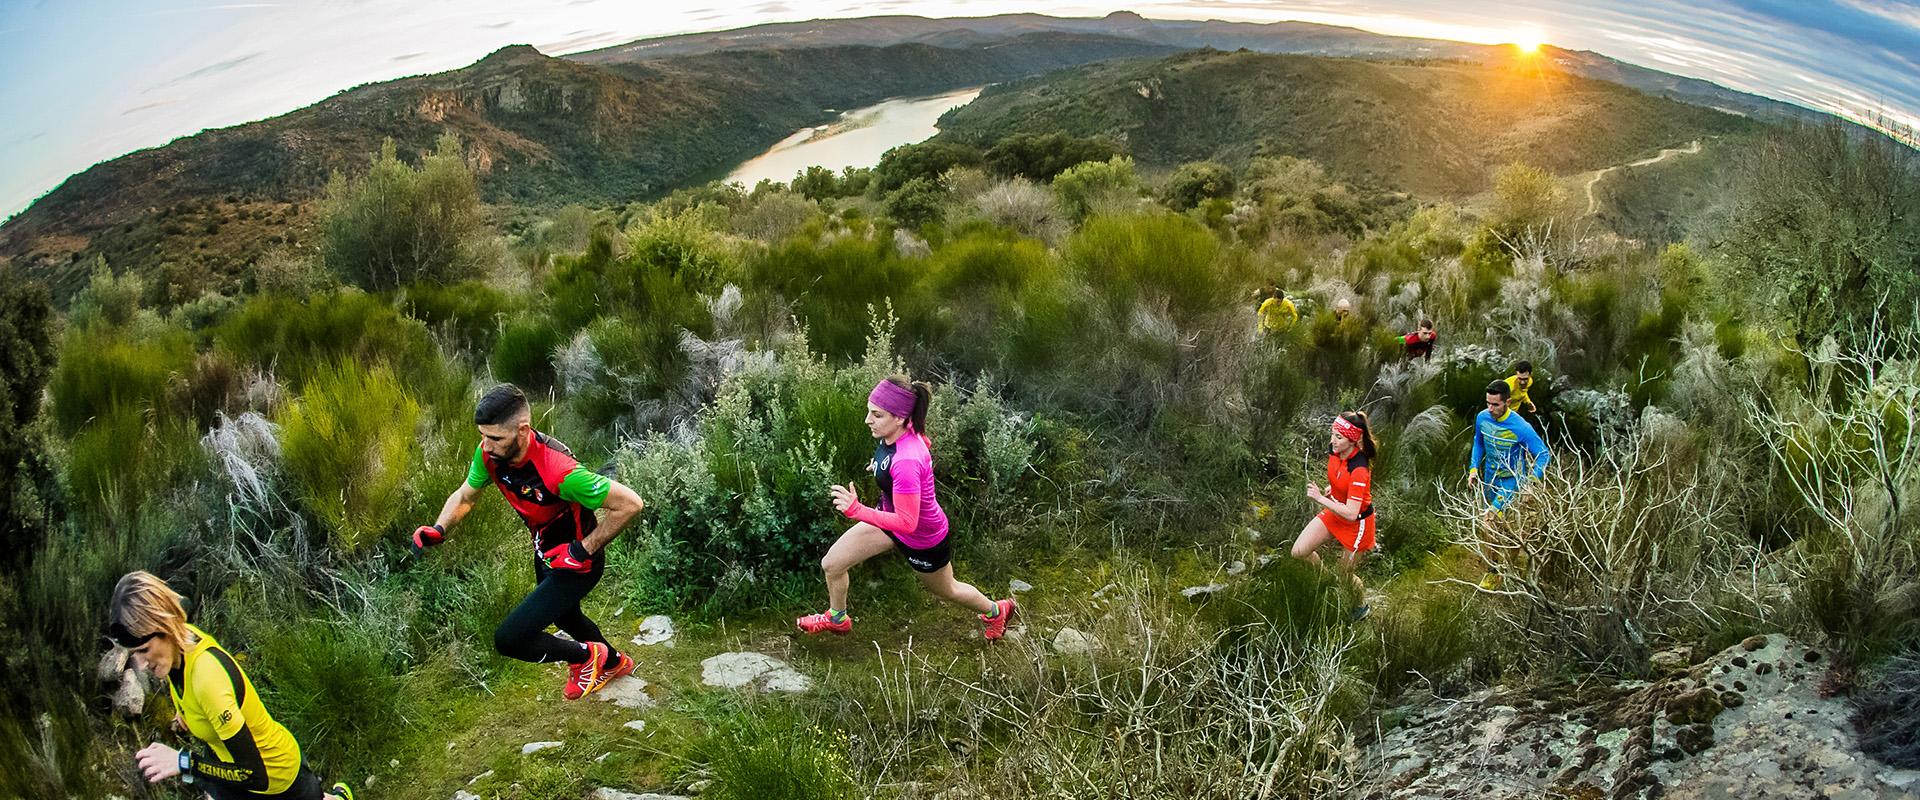 Slider 07 - Arribes Ocultos Trail